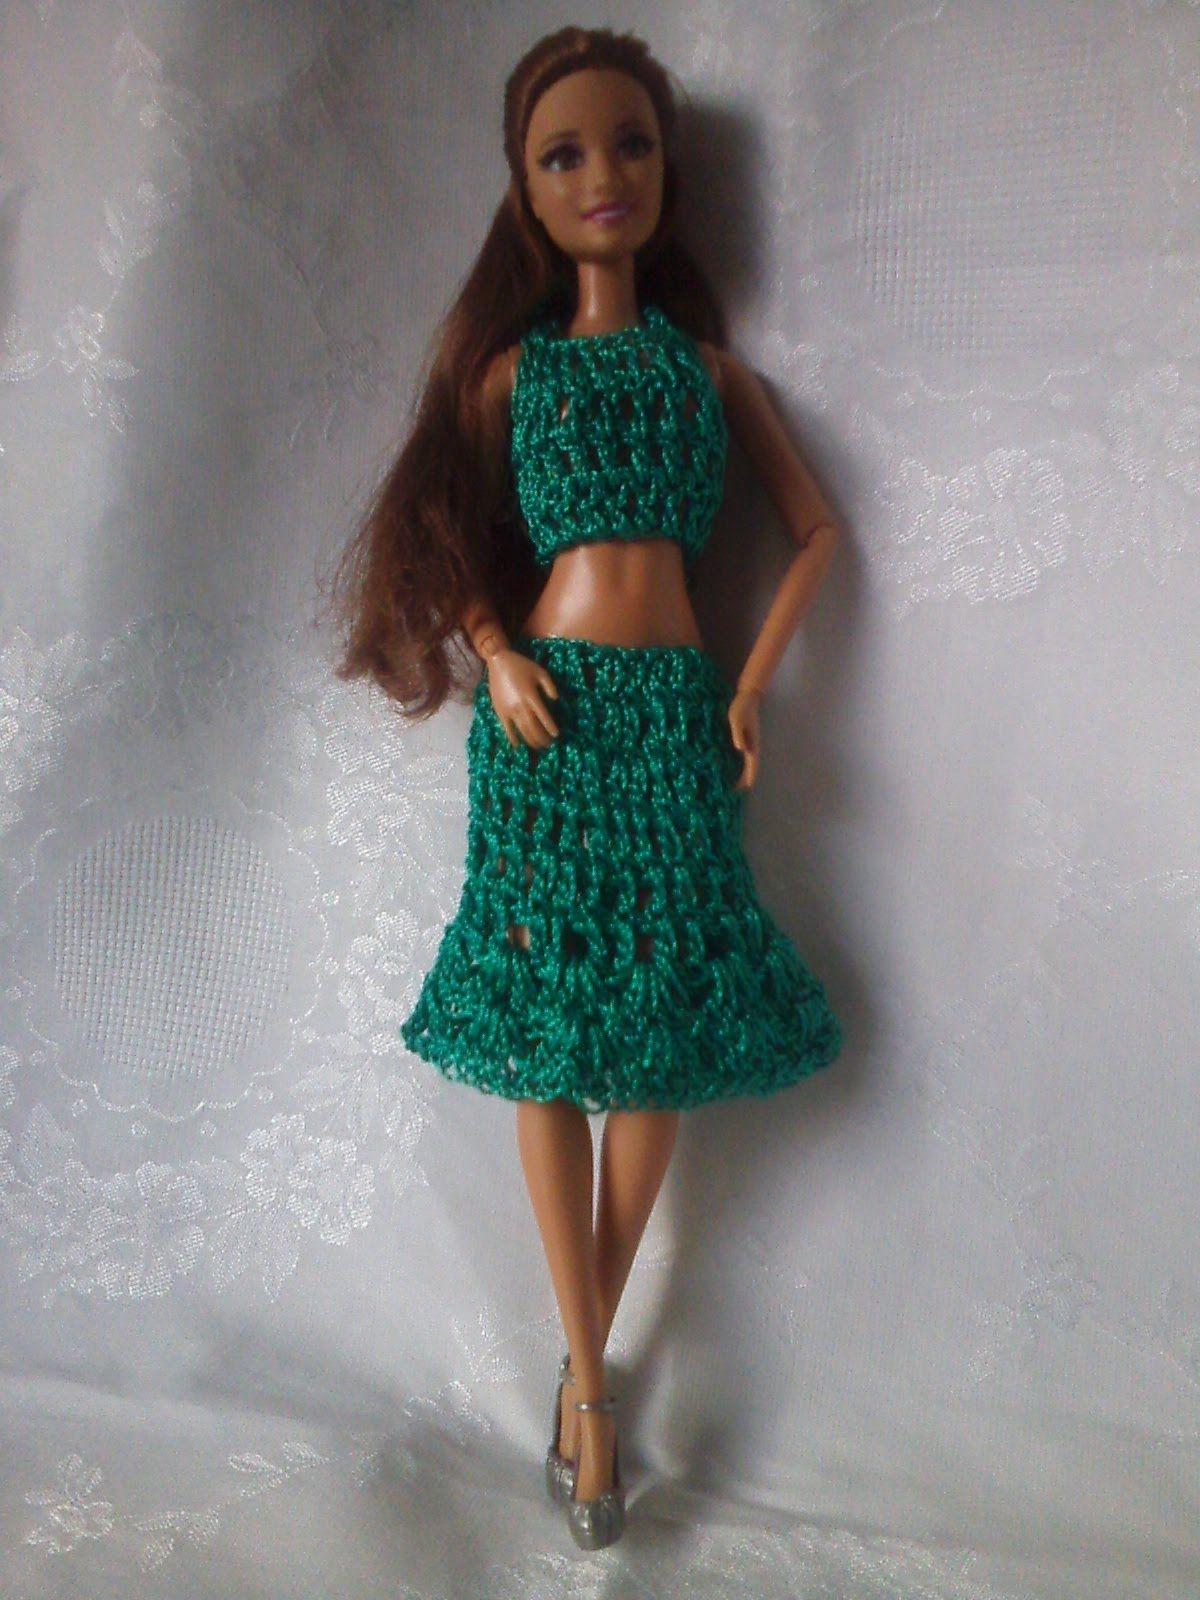 ROUPAS DA BARBIE DE CROCHÊ   vestidos barby   Pinterest   Crochet ...